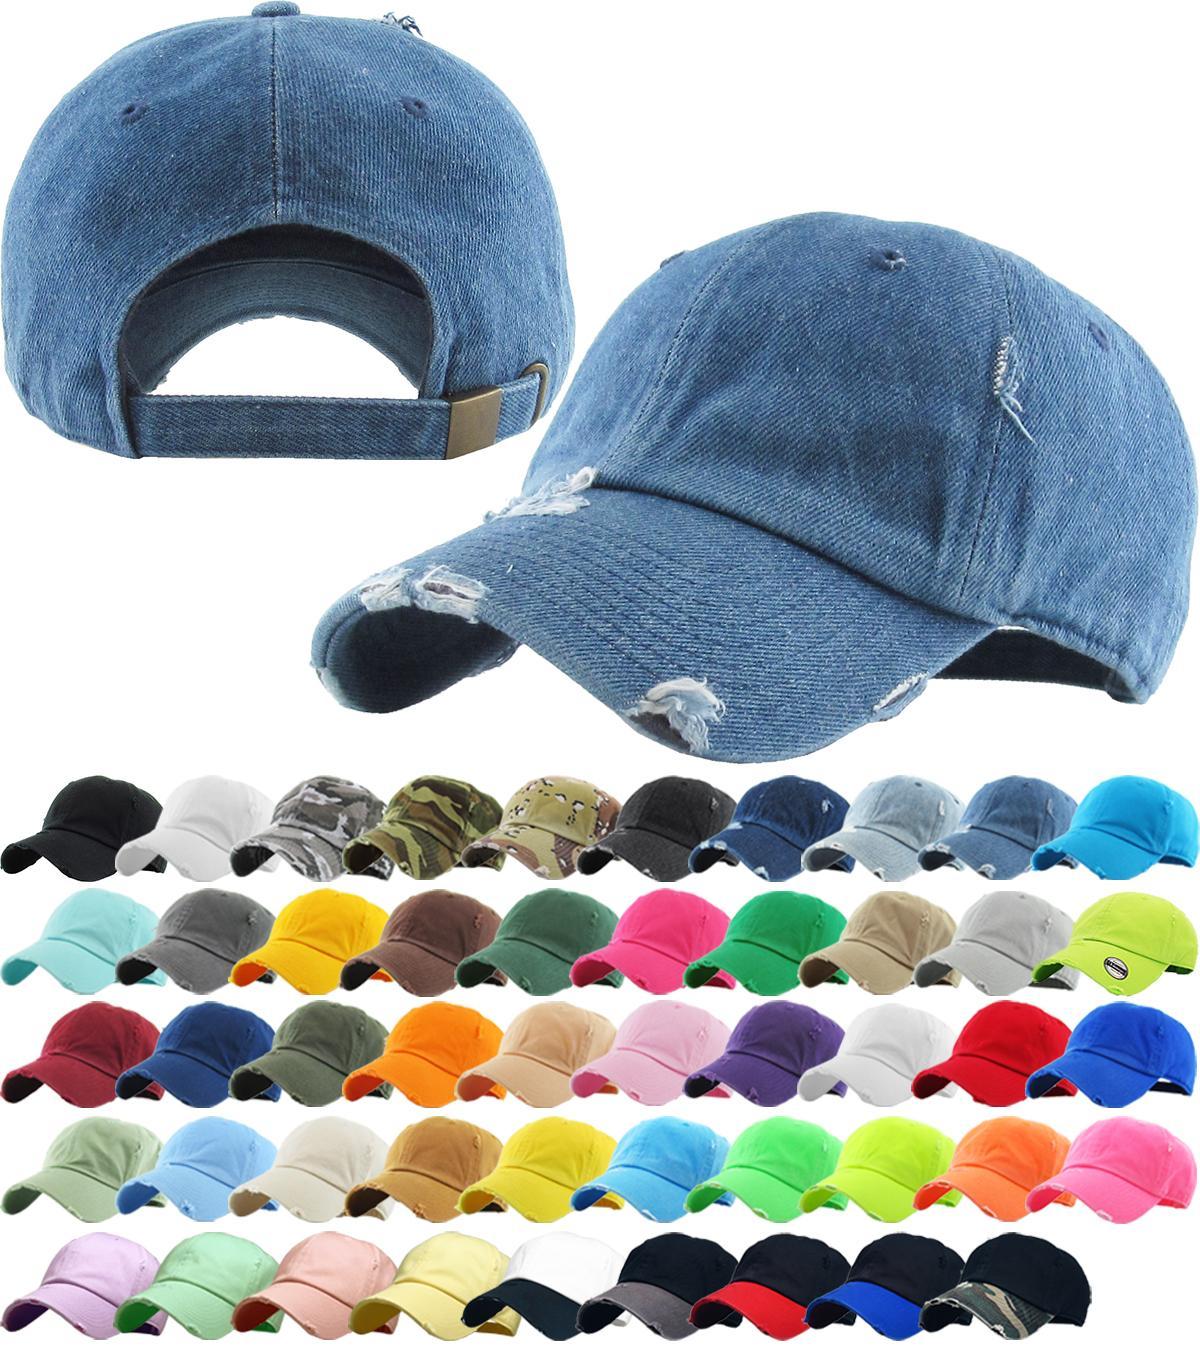 Wholesaler Cap